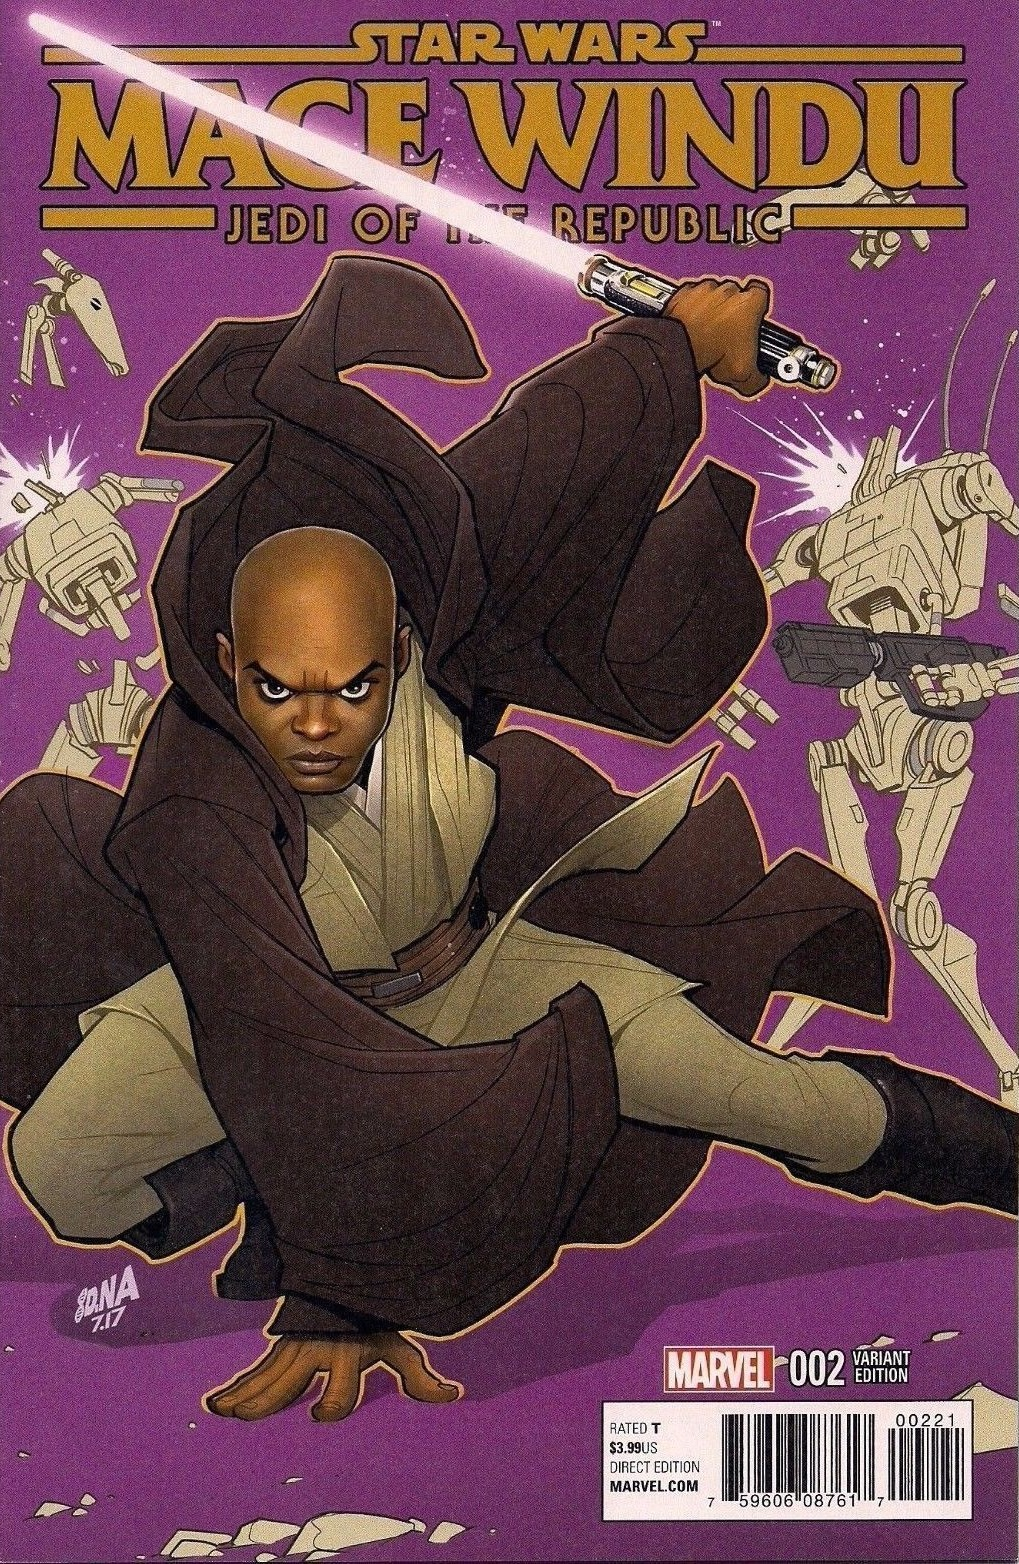 Jedi of the Republic – Mace Windu #2 (David Nakayama Variant Cover) (06.09.2017)